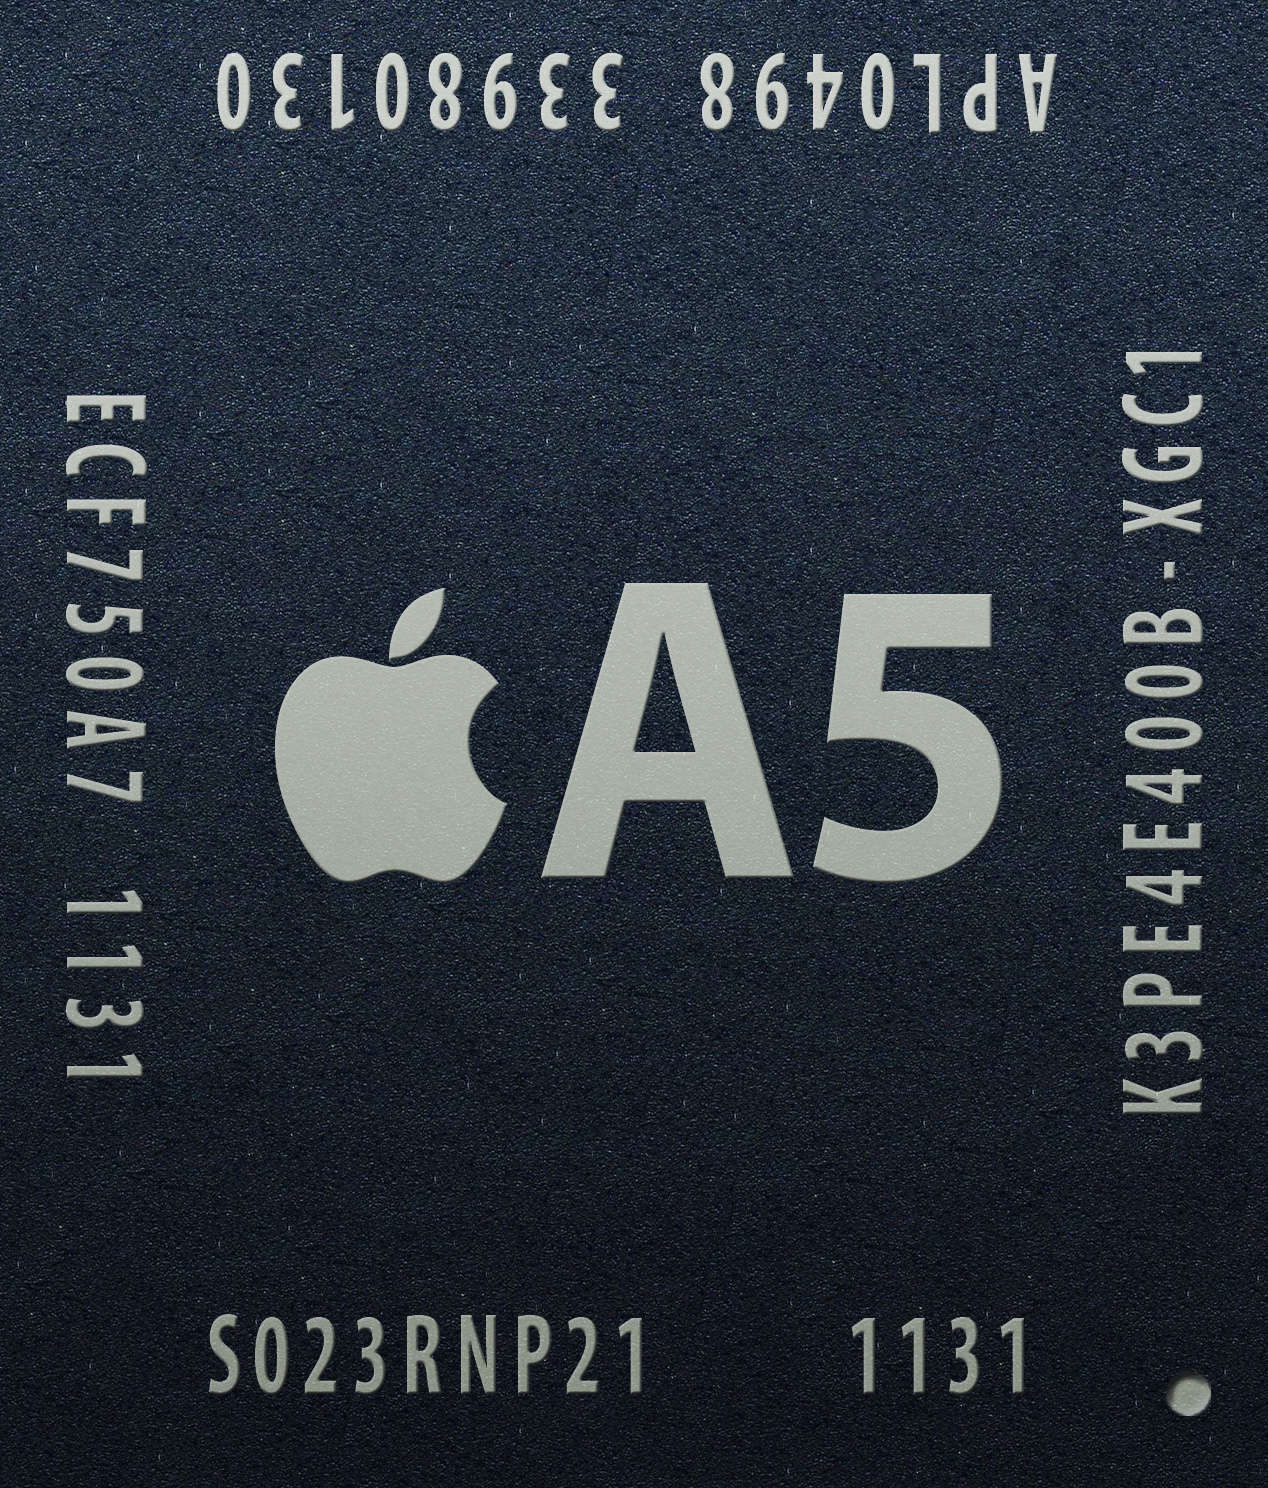 Apple A5 - Wikipedia